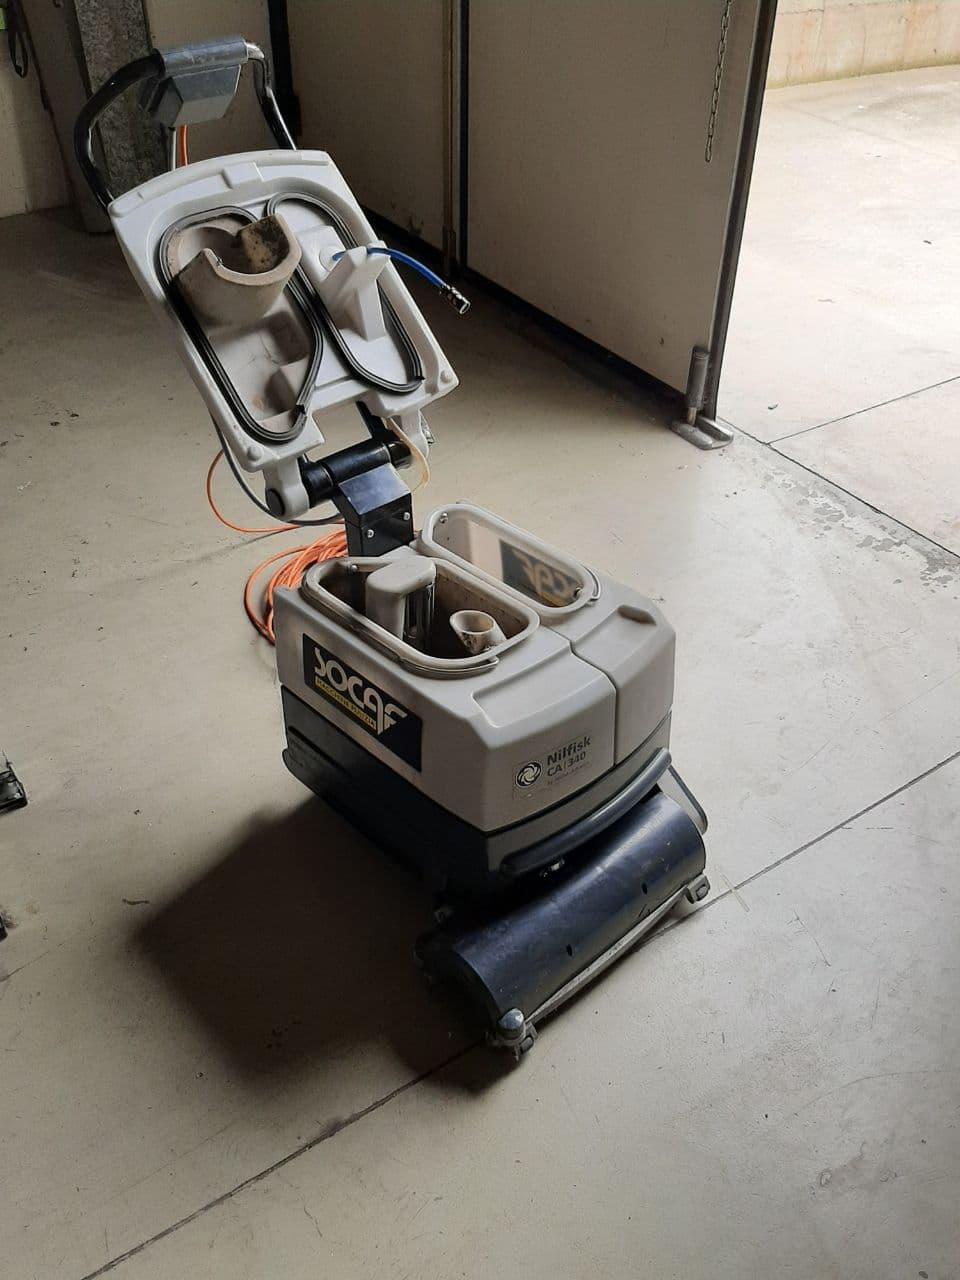 Macchina lava asciuga pavimenti in vendita - foto 1